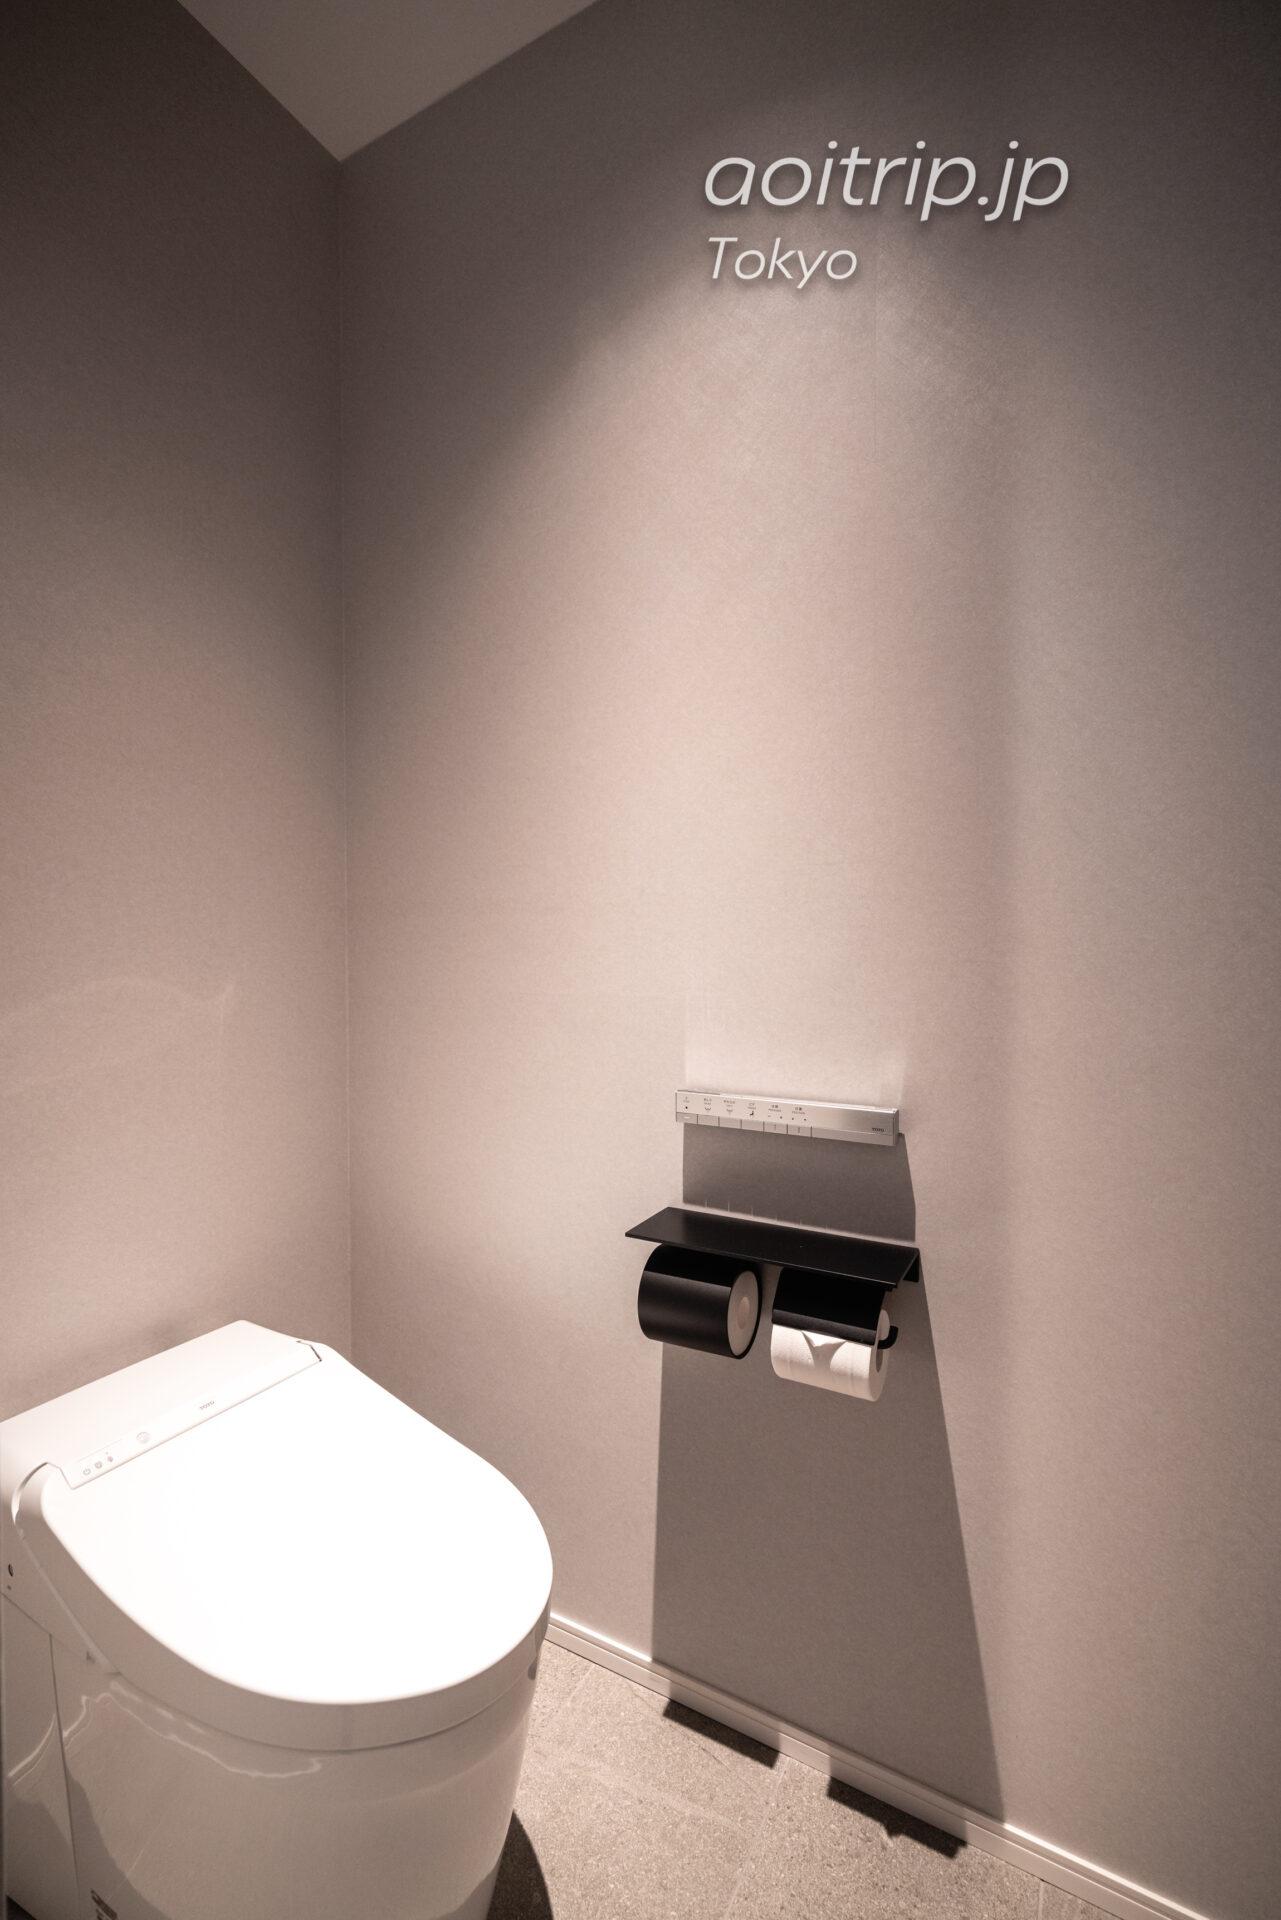 ACホテル東京銀座のトイレ